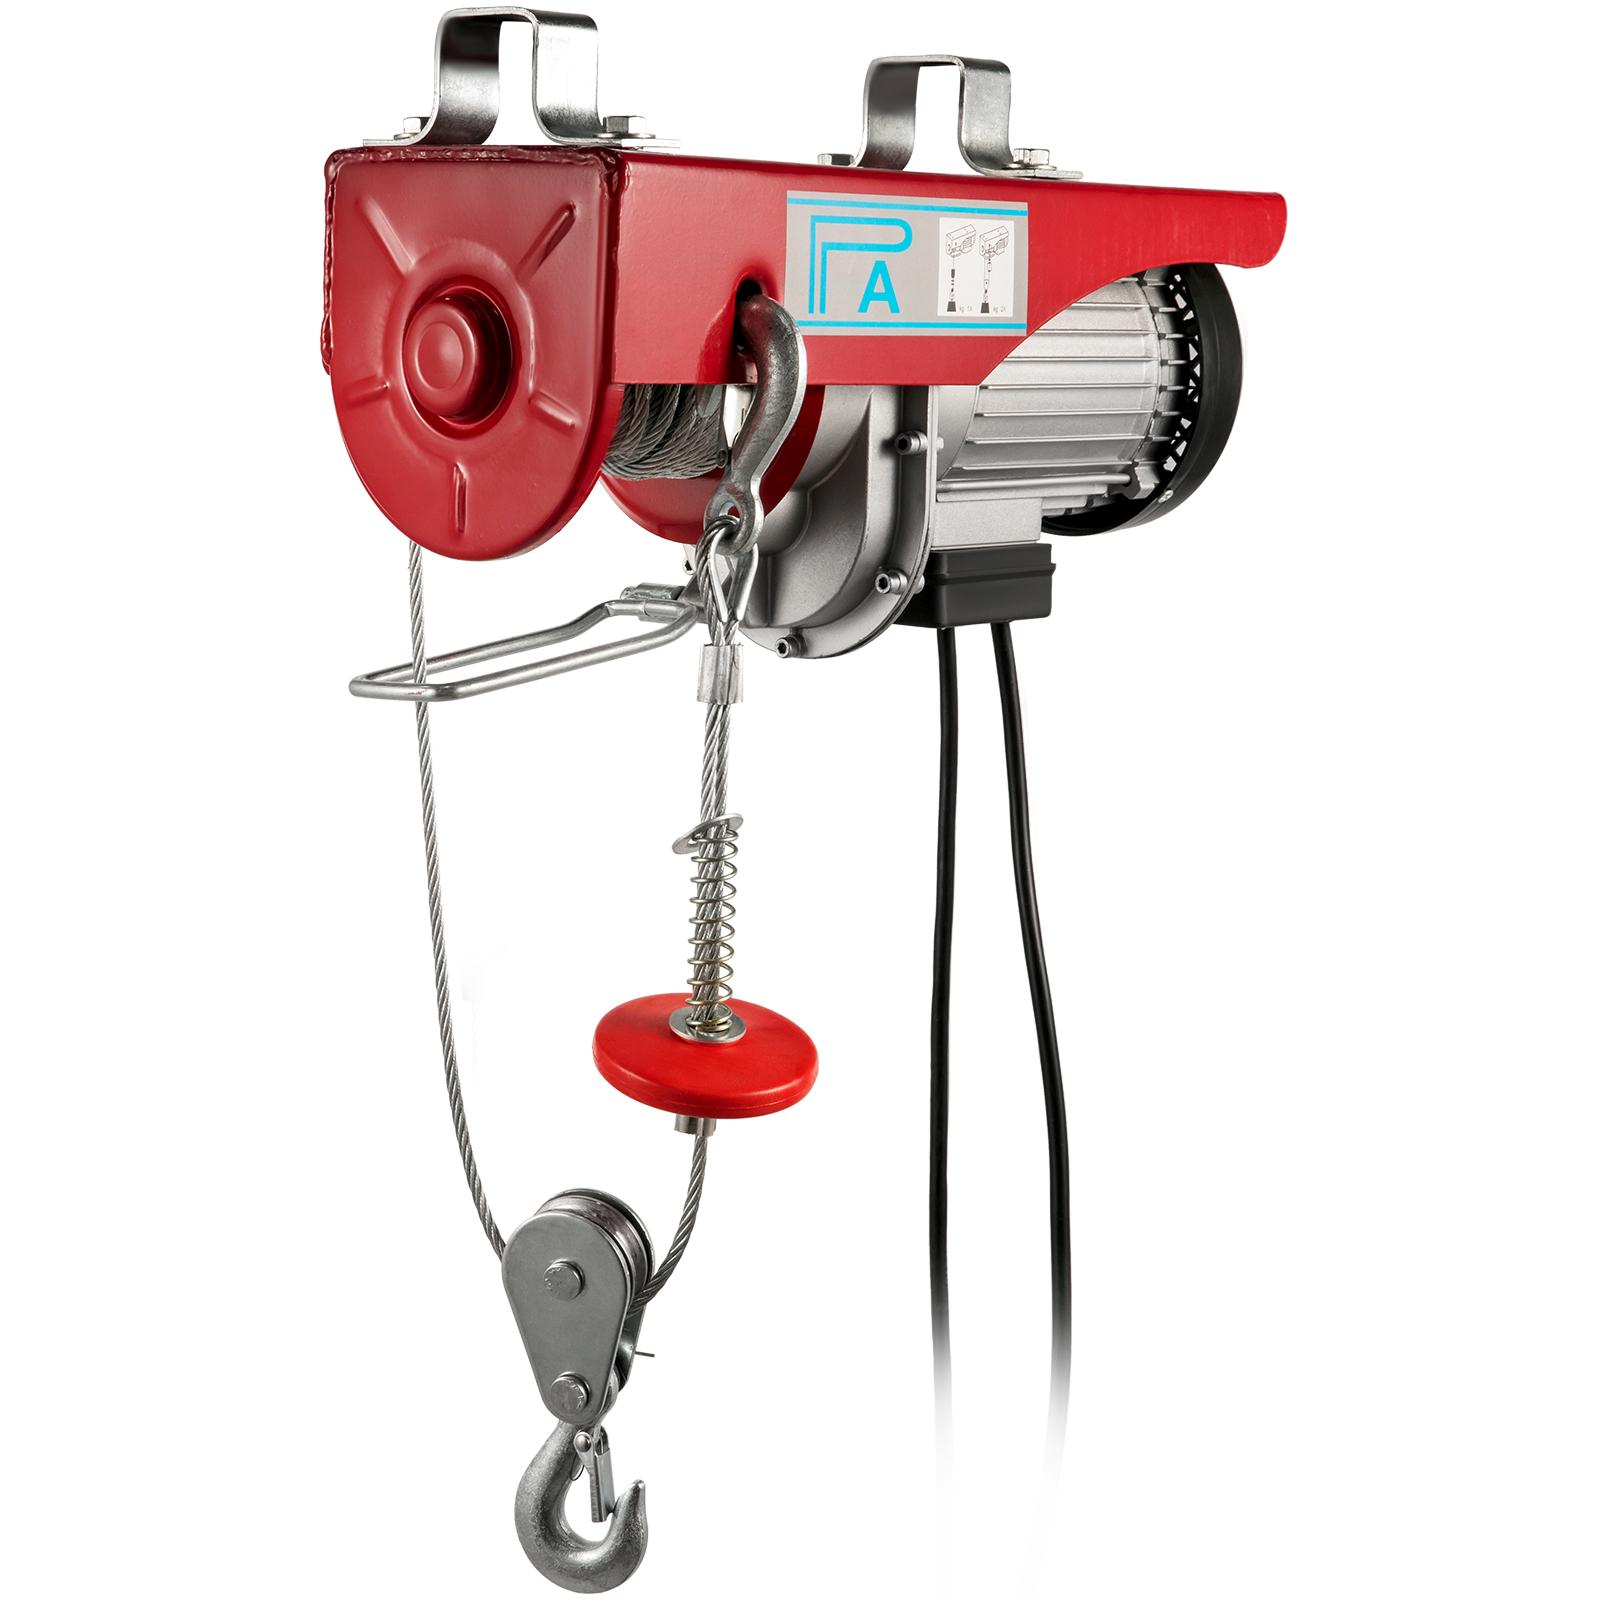 100kg-900kg-Electric-Hoist-Winch-Lifting-Engine-Crane-Cable-Lift-Hook-Garage miniature 82